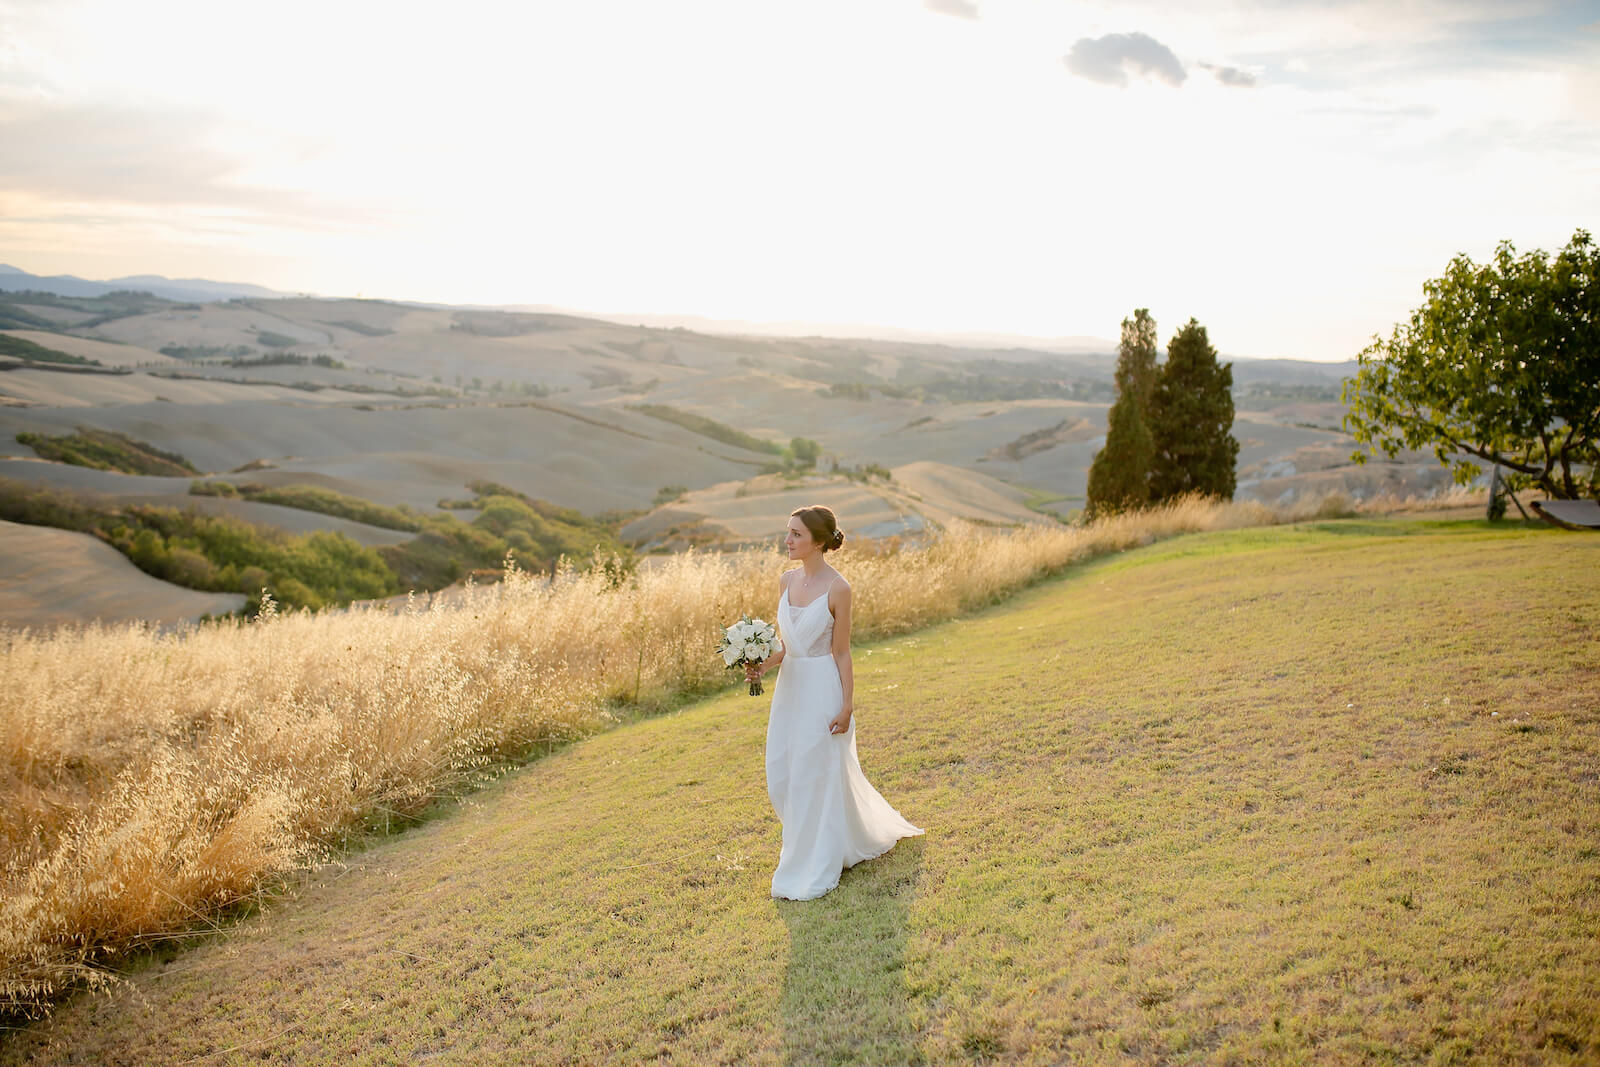 Mariage en Toscane